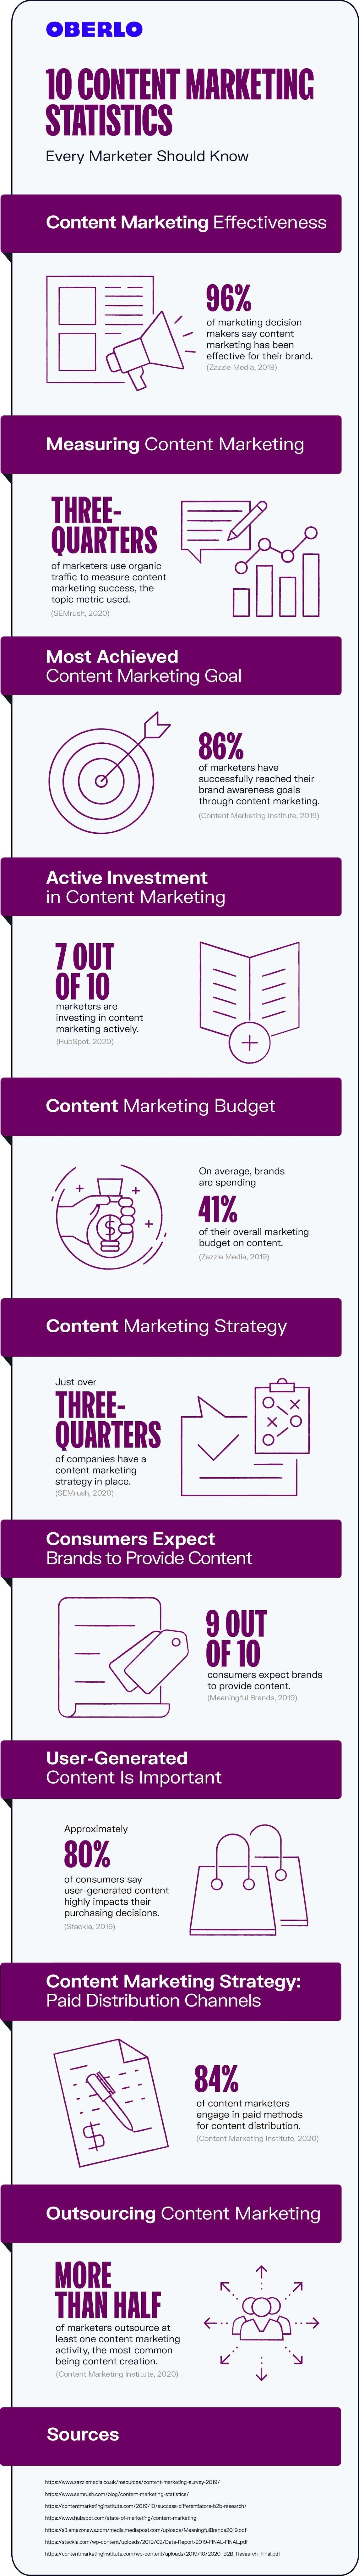 content marketing statistics 2020